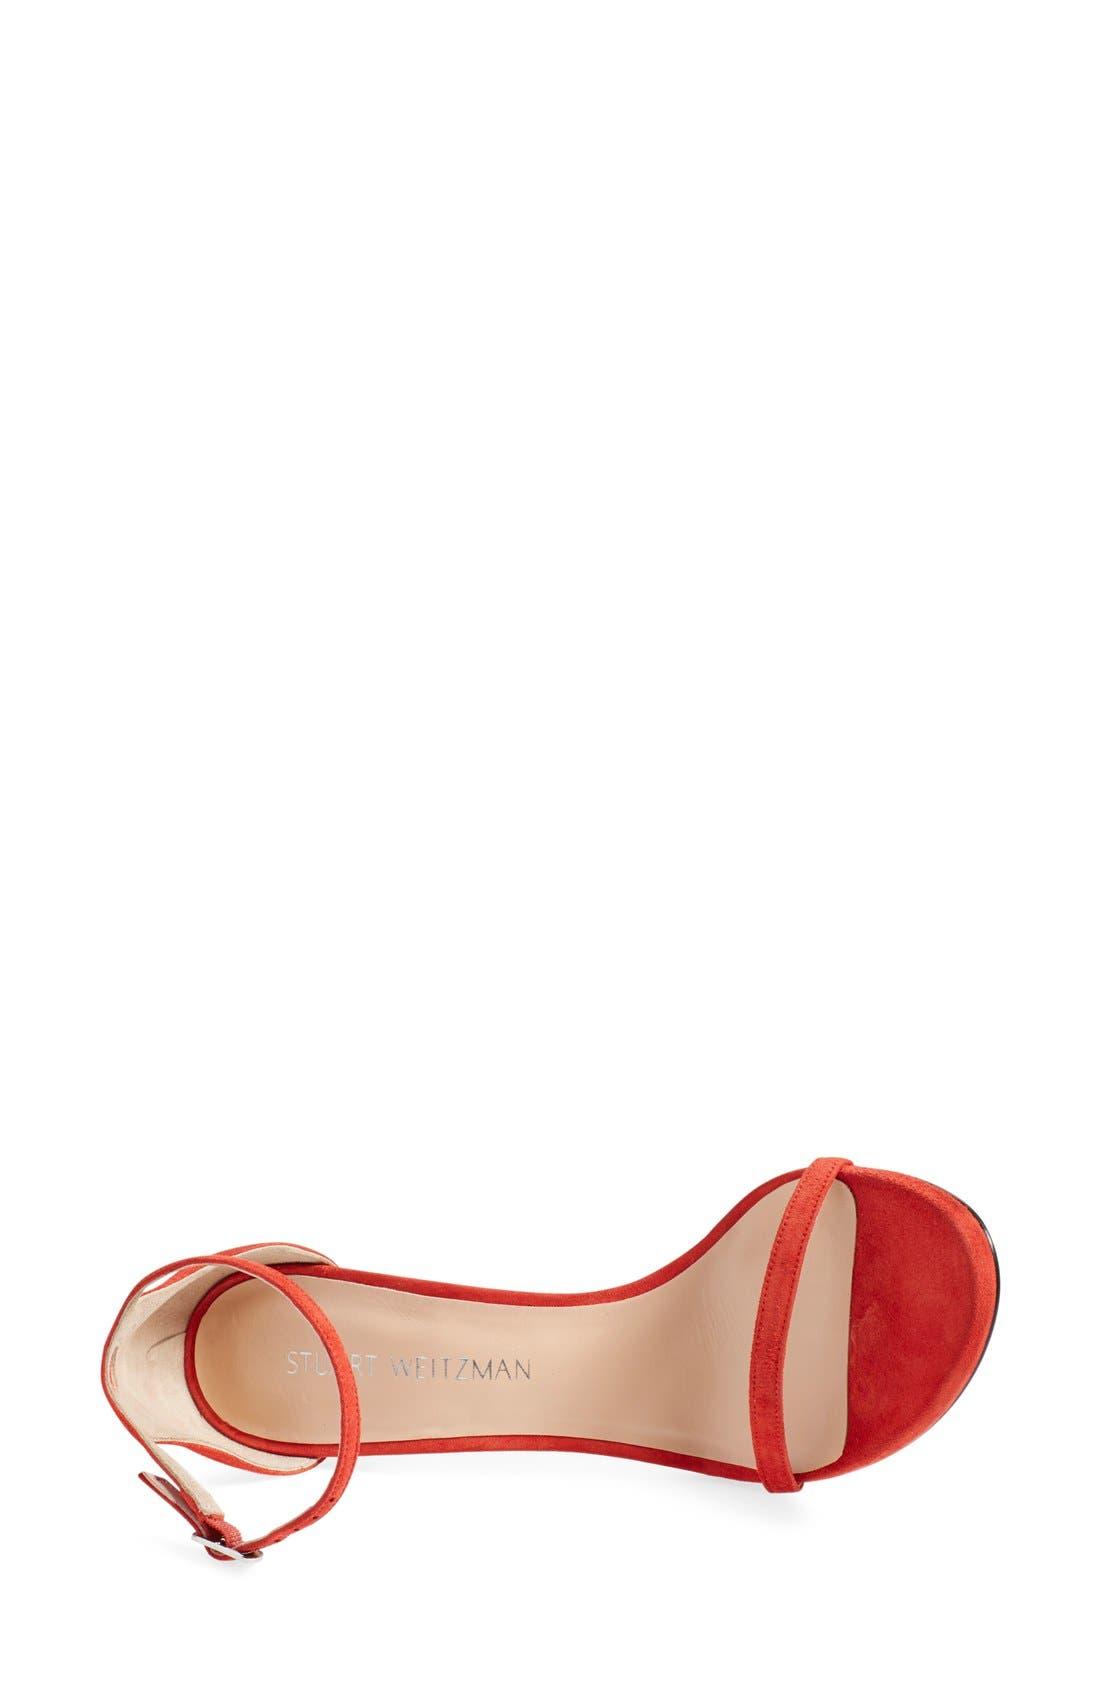 Nudistsong Ankle Strap Sandal,                             Alternate thumbnail 86, color,